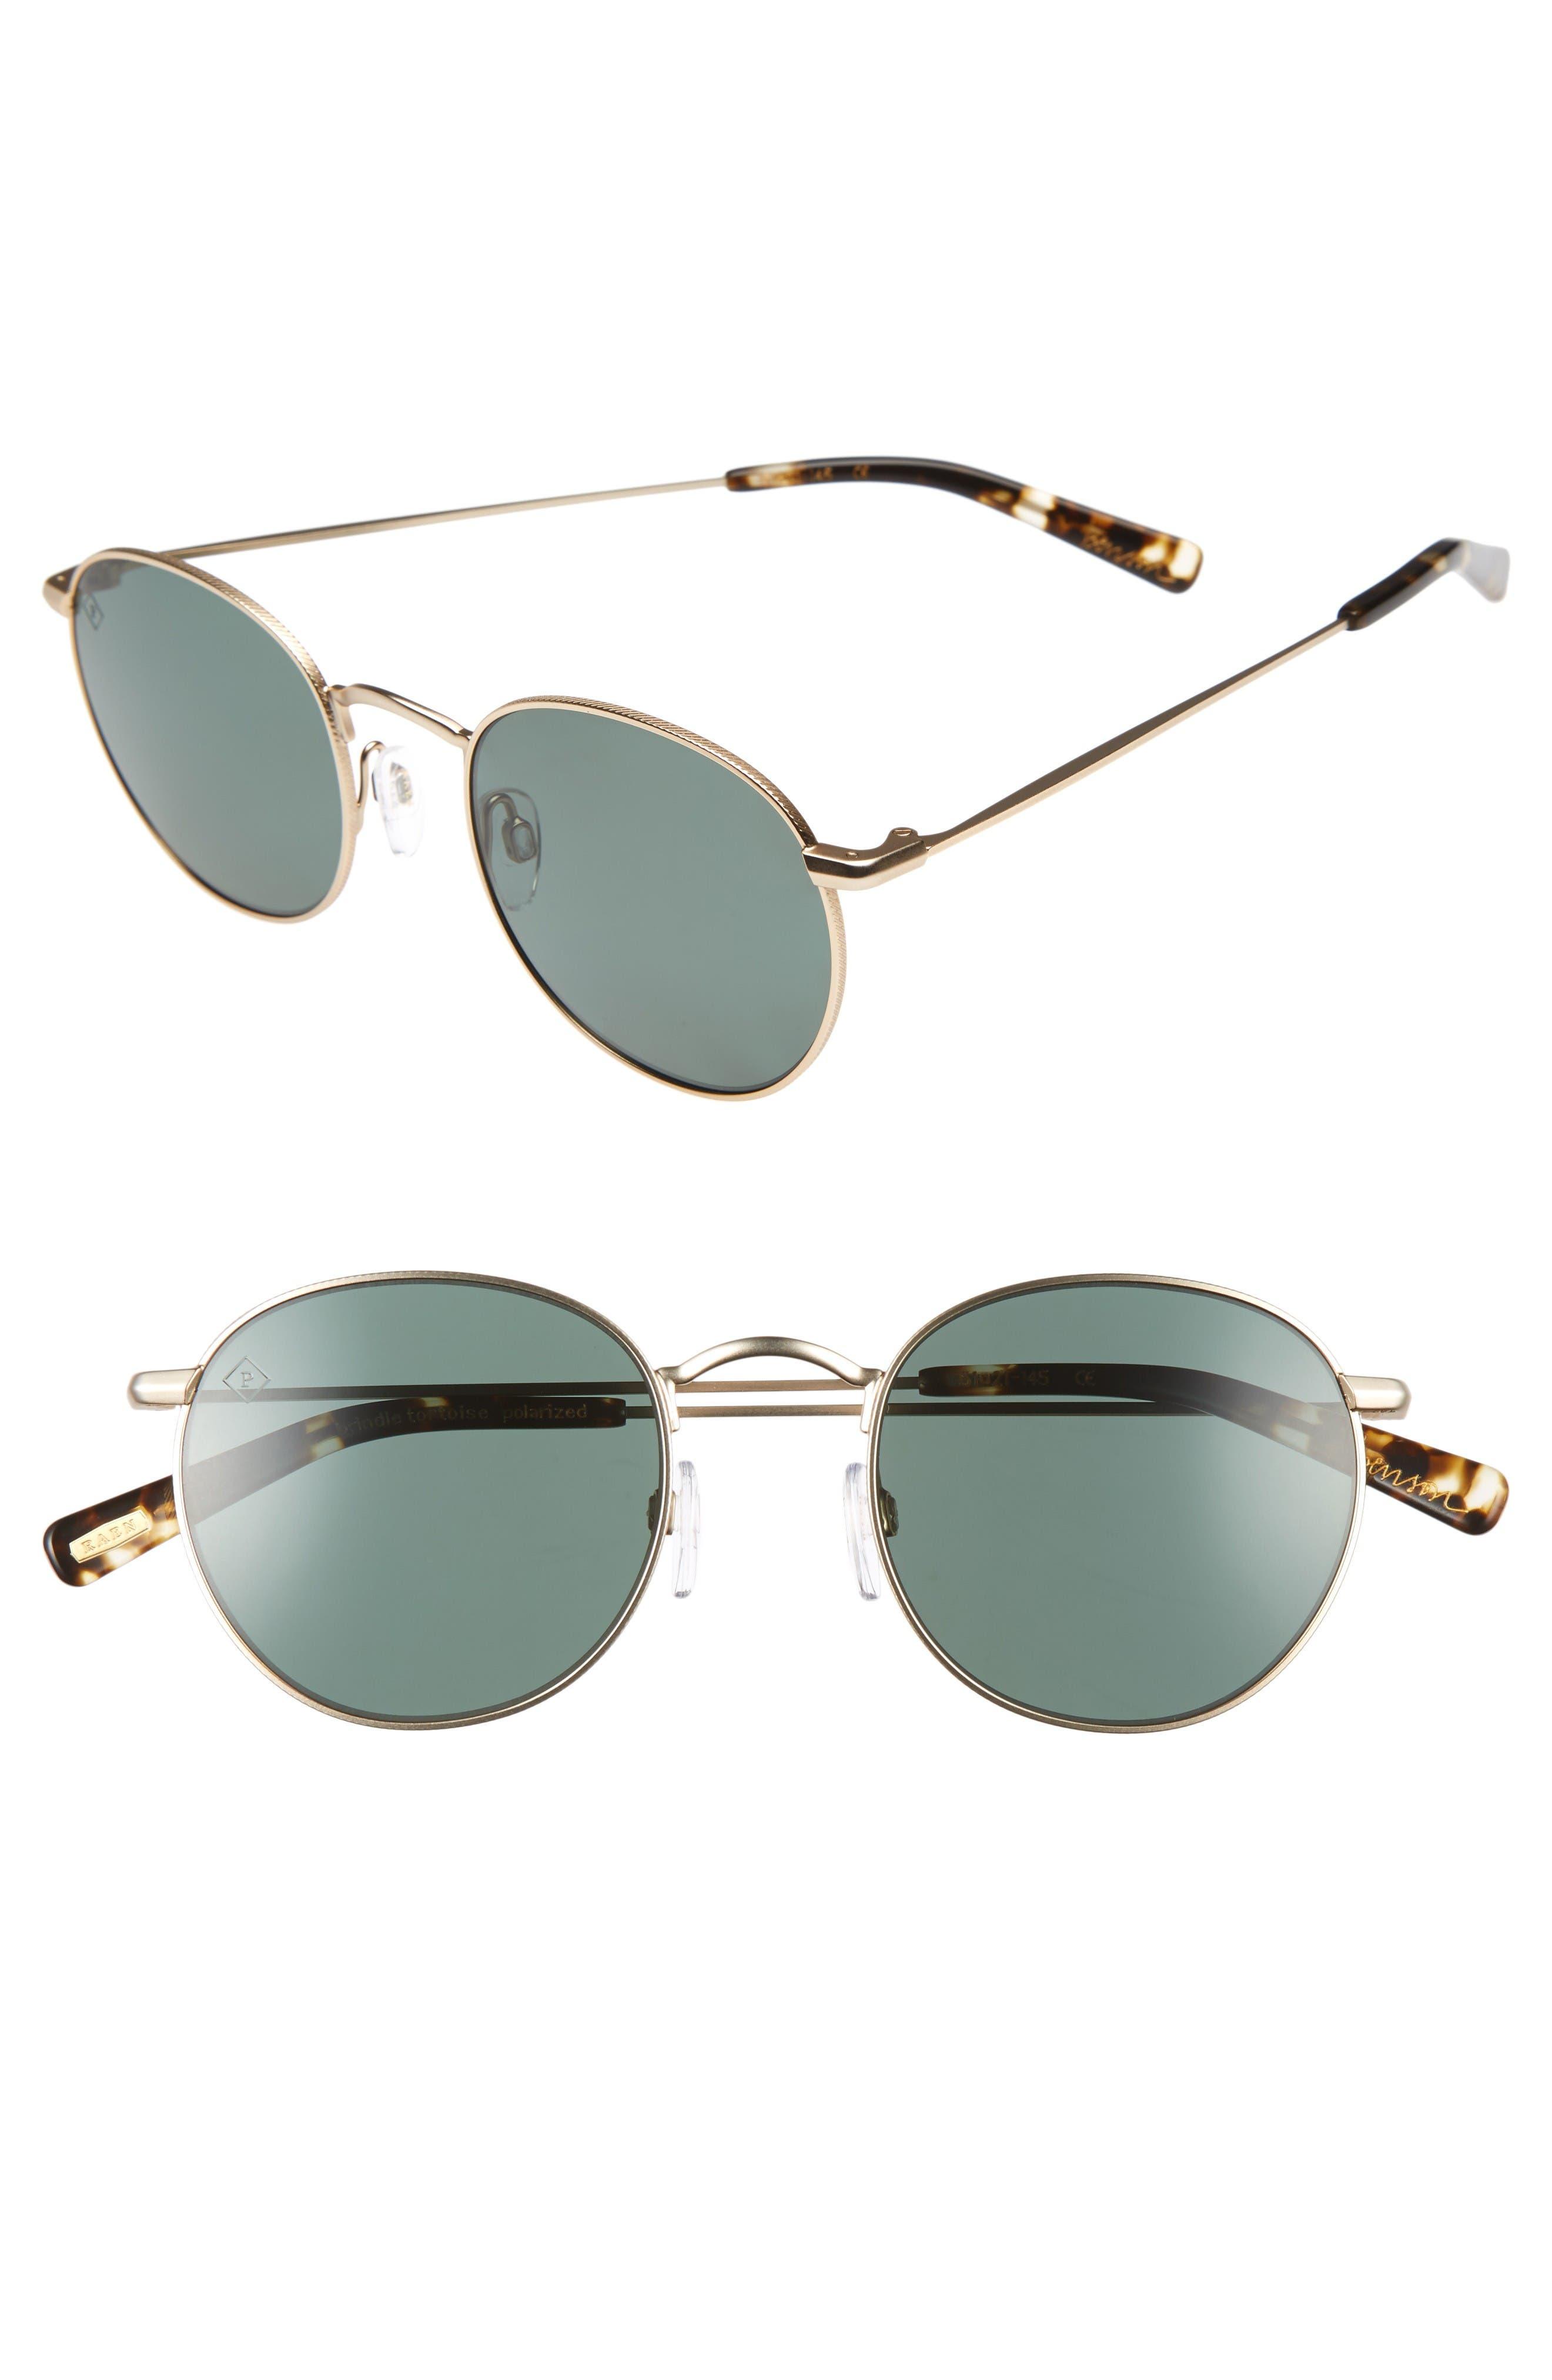 Benson 51mm Polarized Sunglasses,                             Main thumbnail 1, color,                             Gold/ Brindle